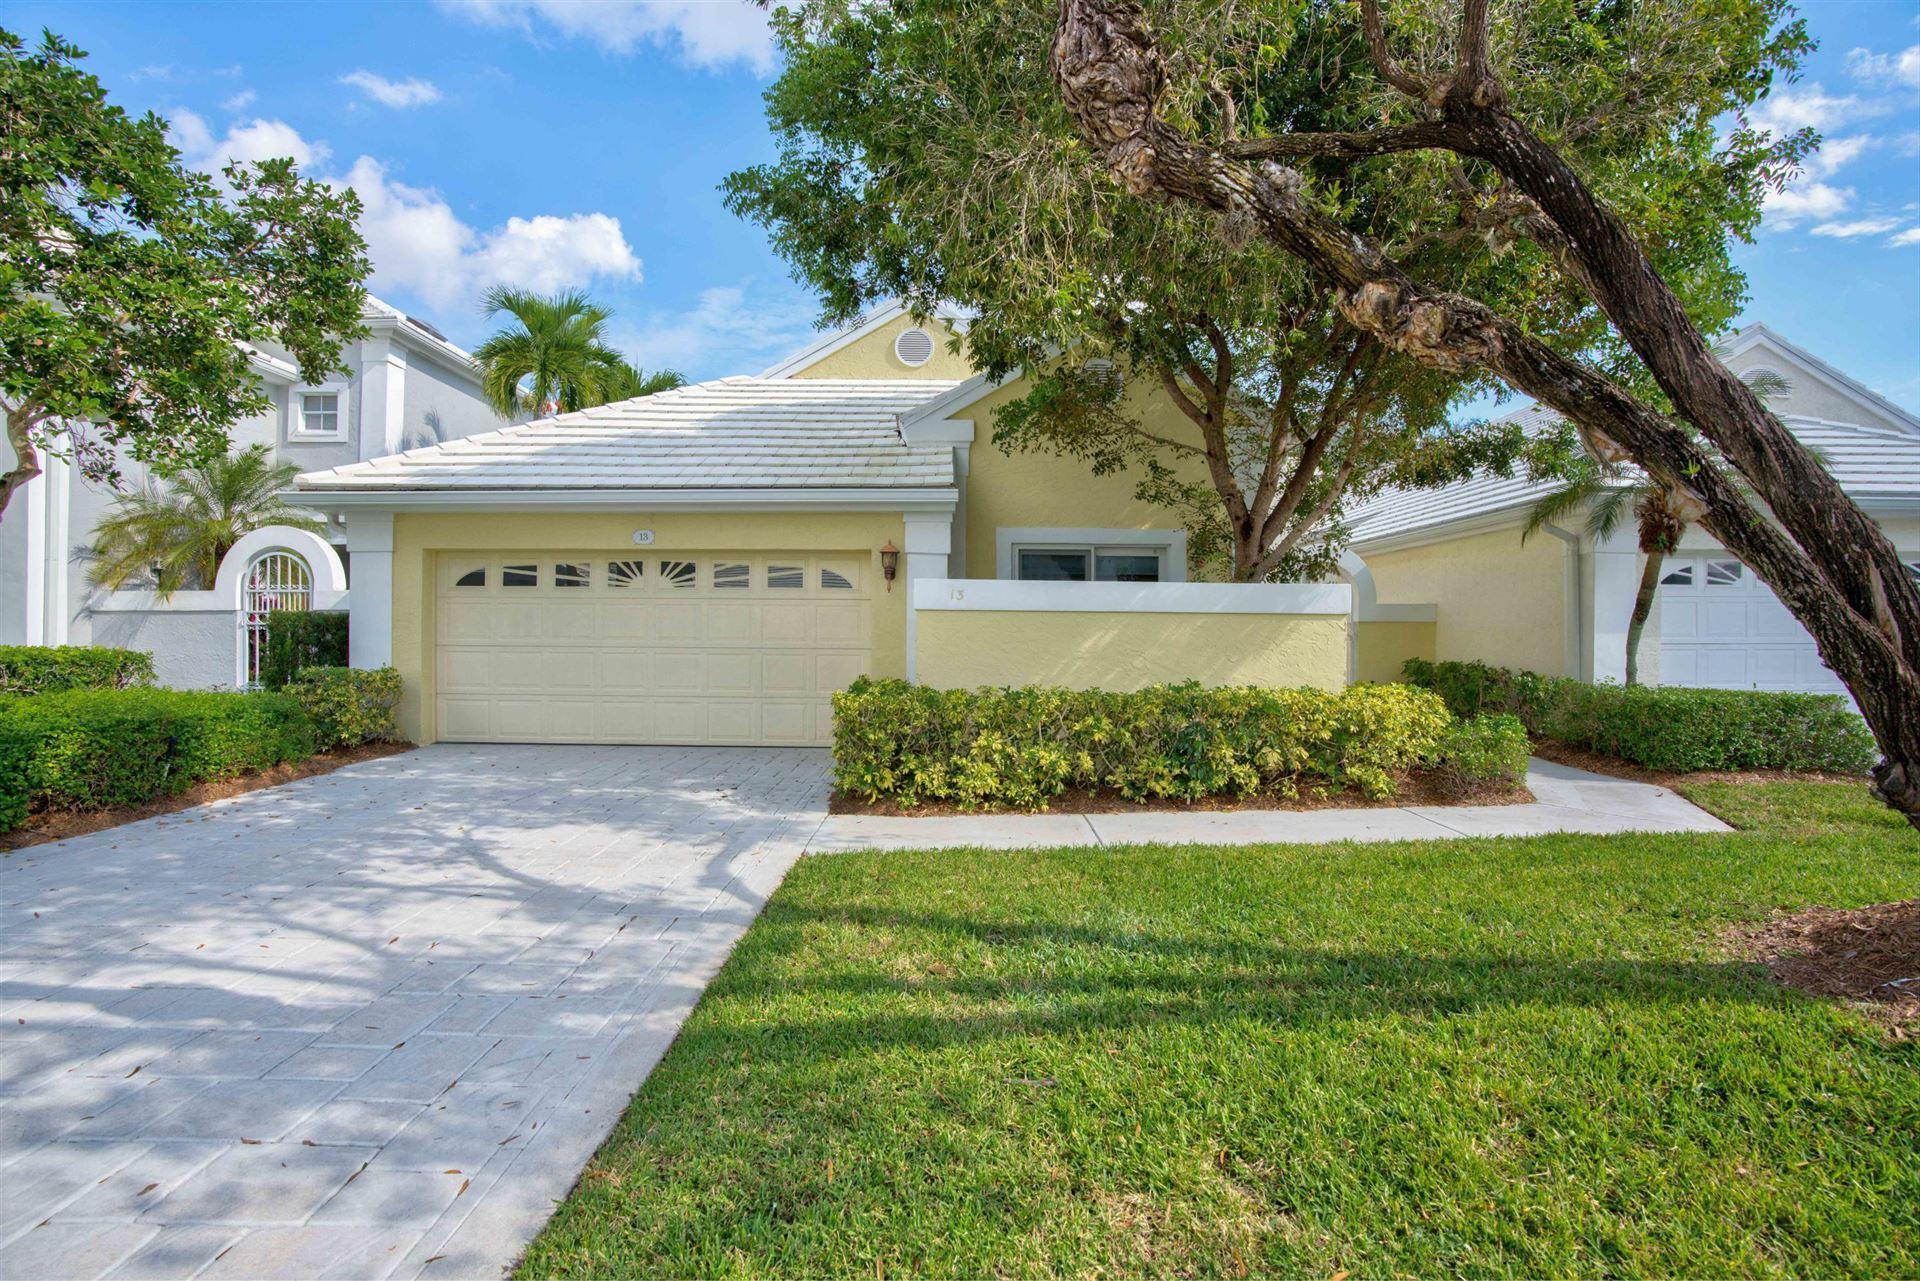 Photo of 13 Wyndham Lane, Palm Beach Gardens, FL 33418 (MLS # RX-10674970)